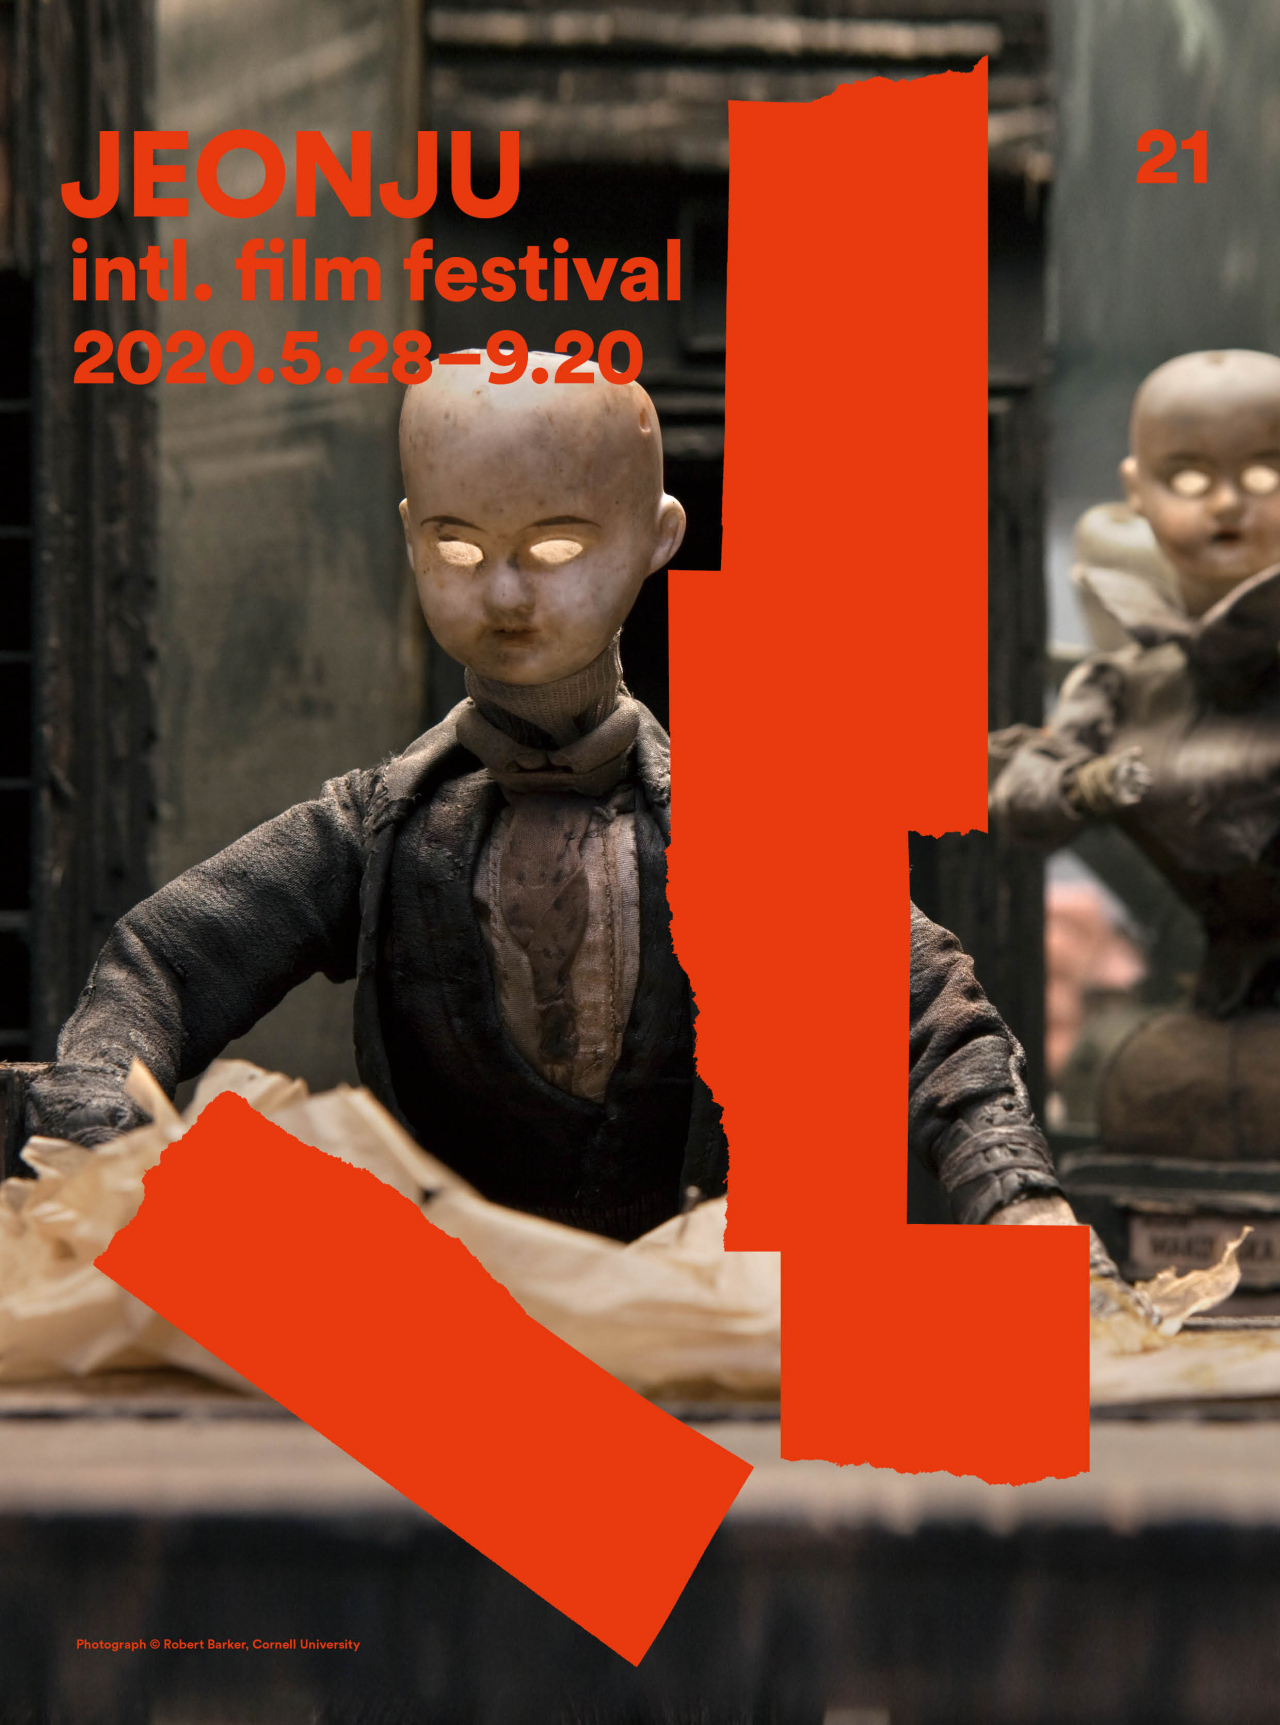 Poster for the 21nd Jeonju International Film Festival (Jeonju IFF)